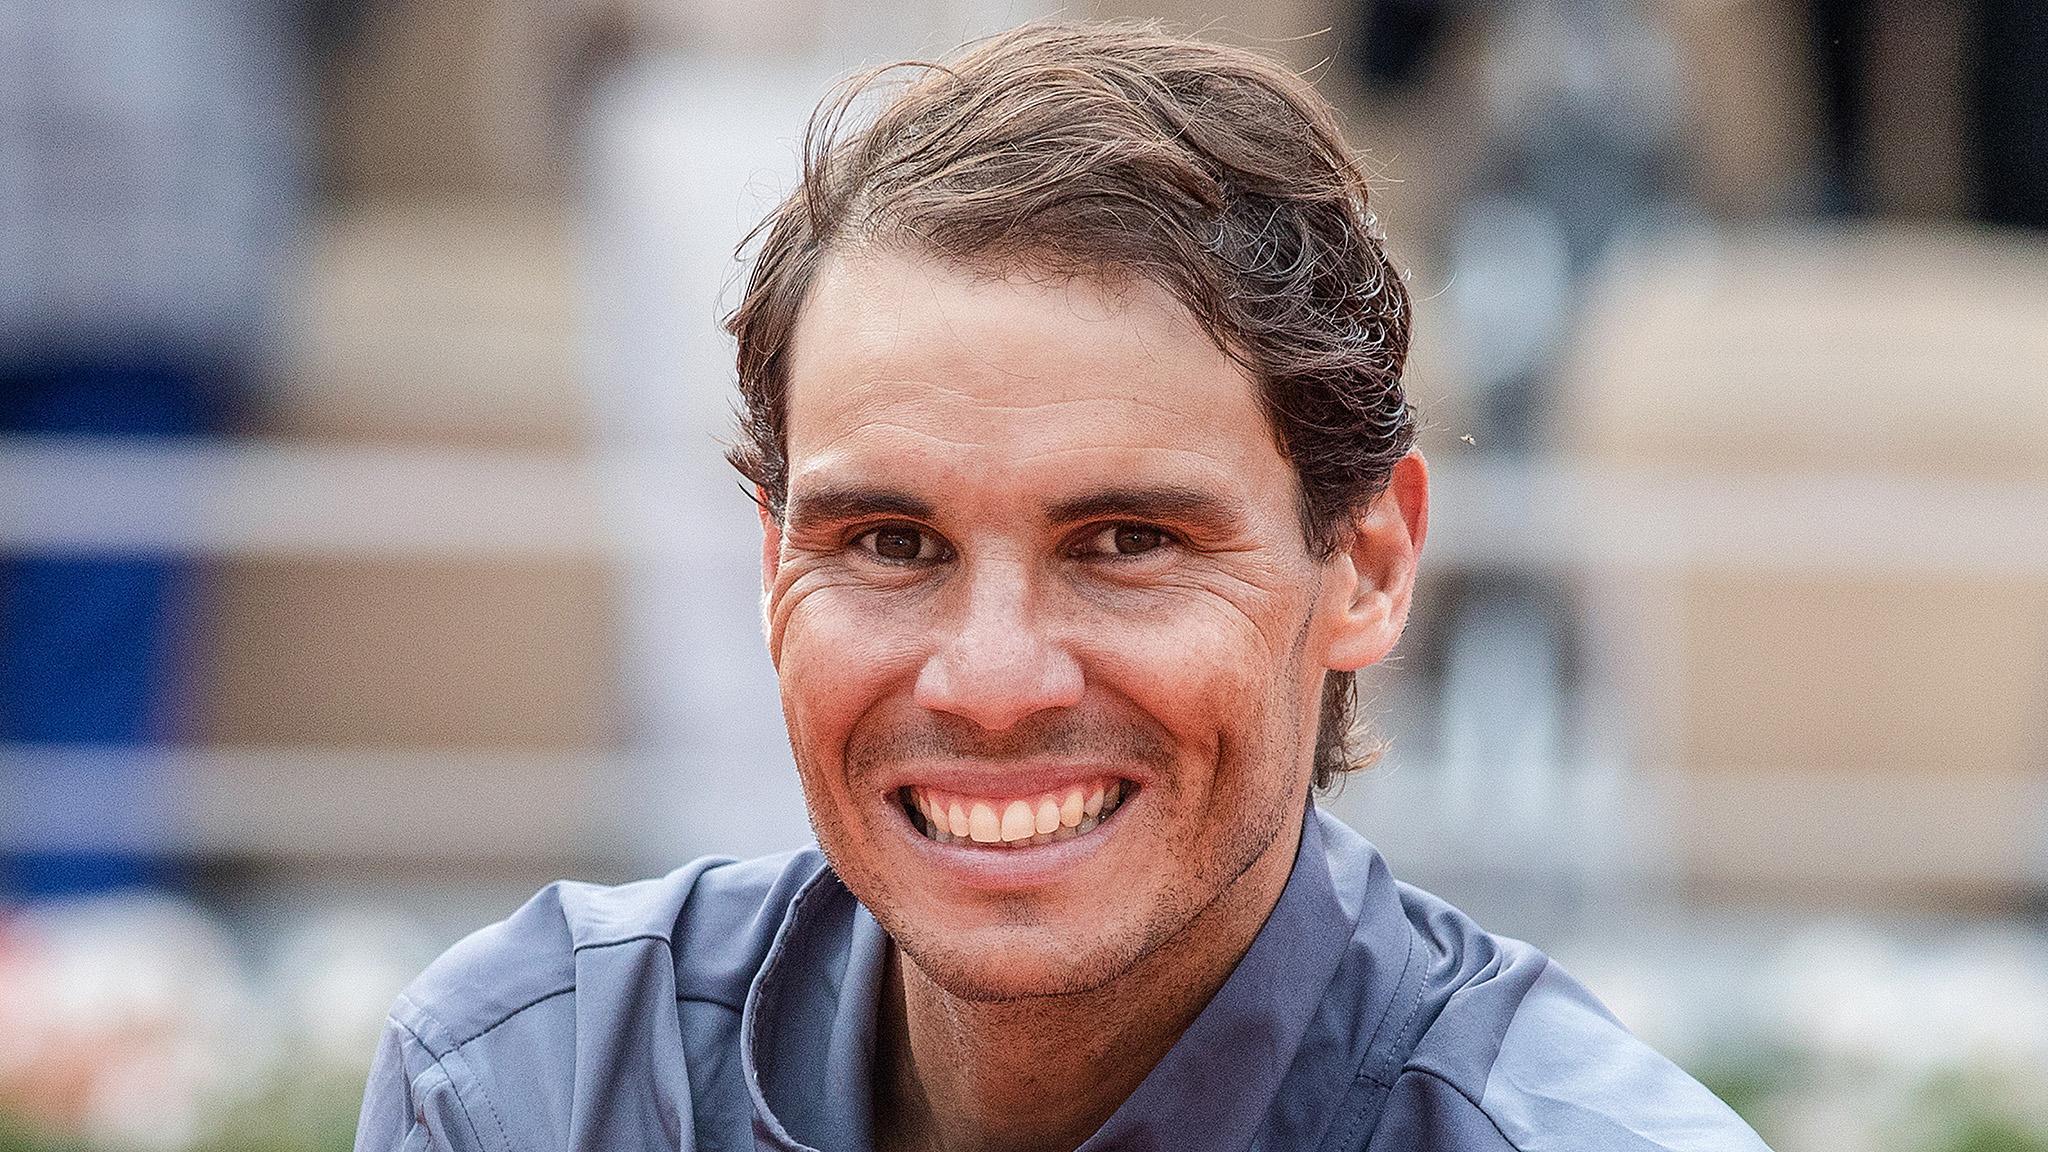 Rafael Nadal S Watch Designed To Court Danger At Wimbledon Financial Times